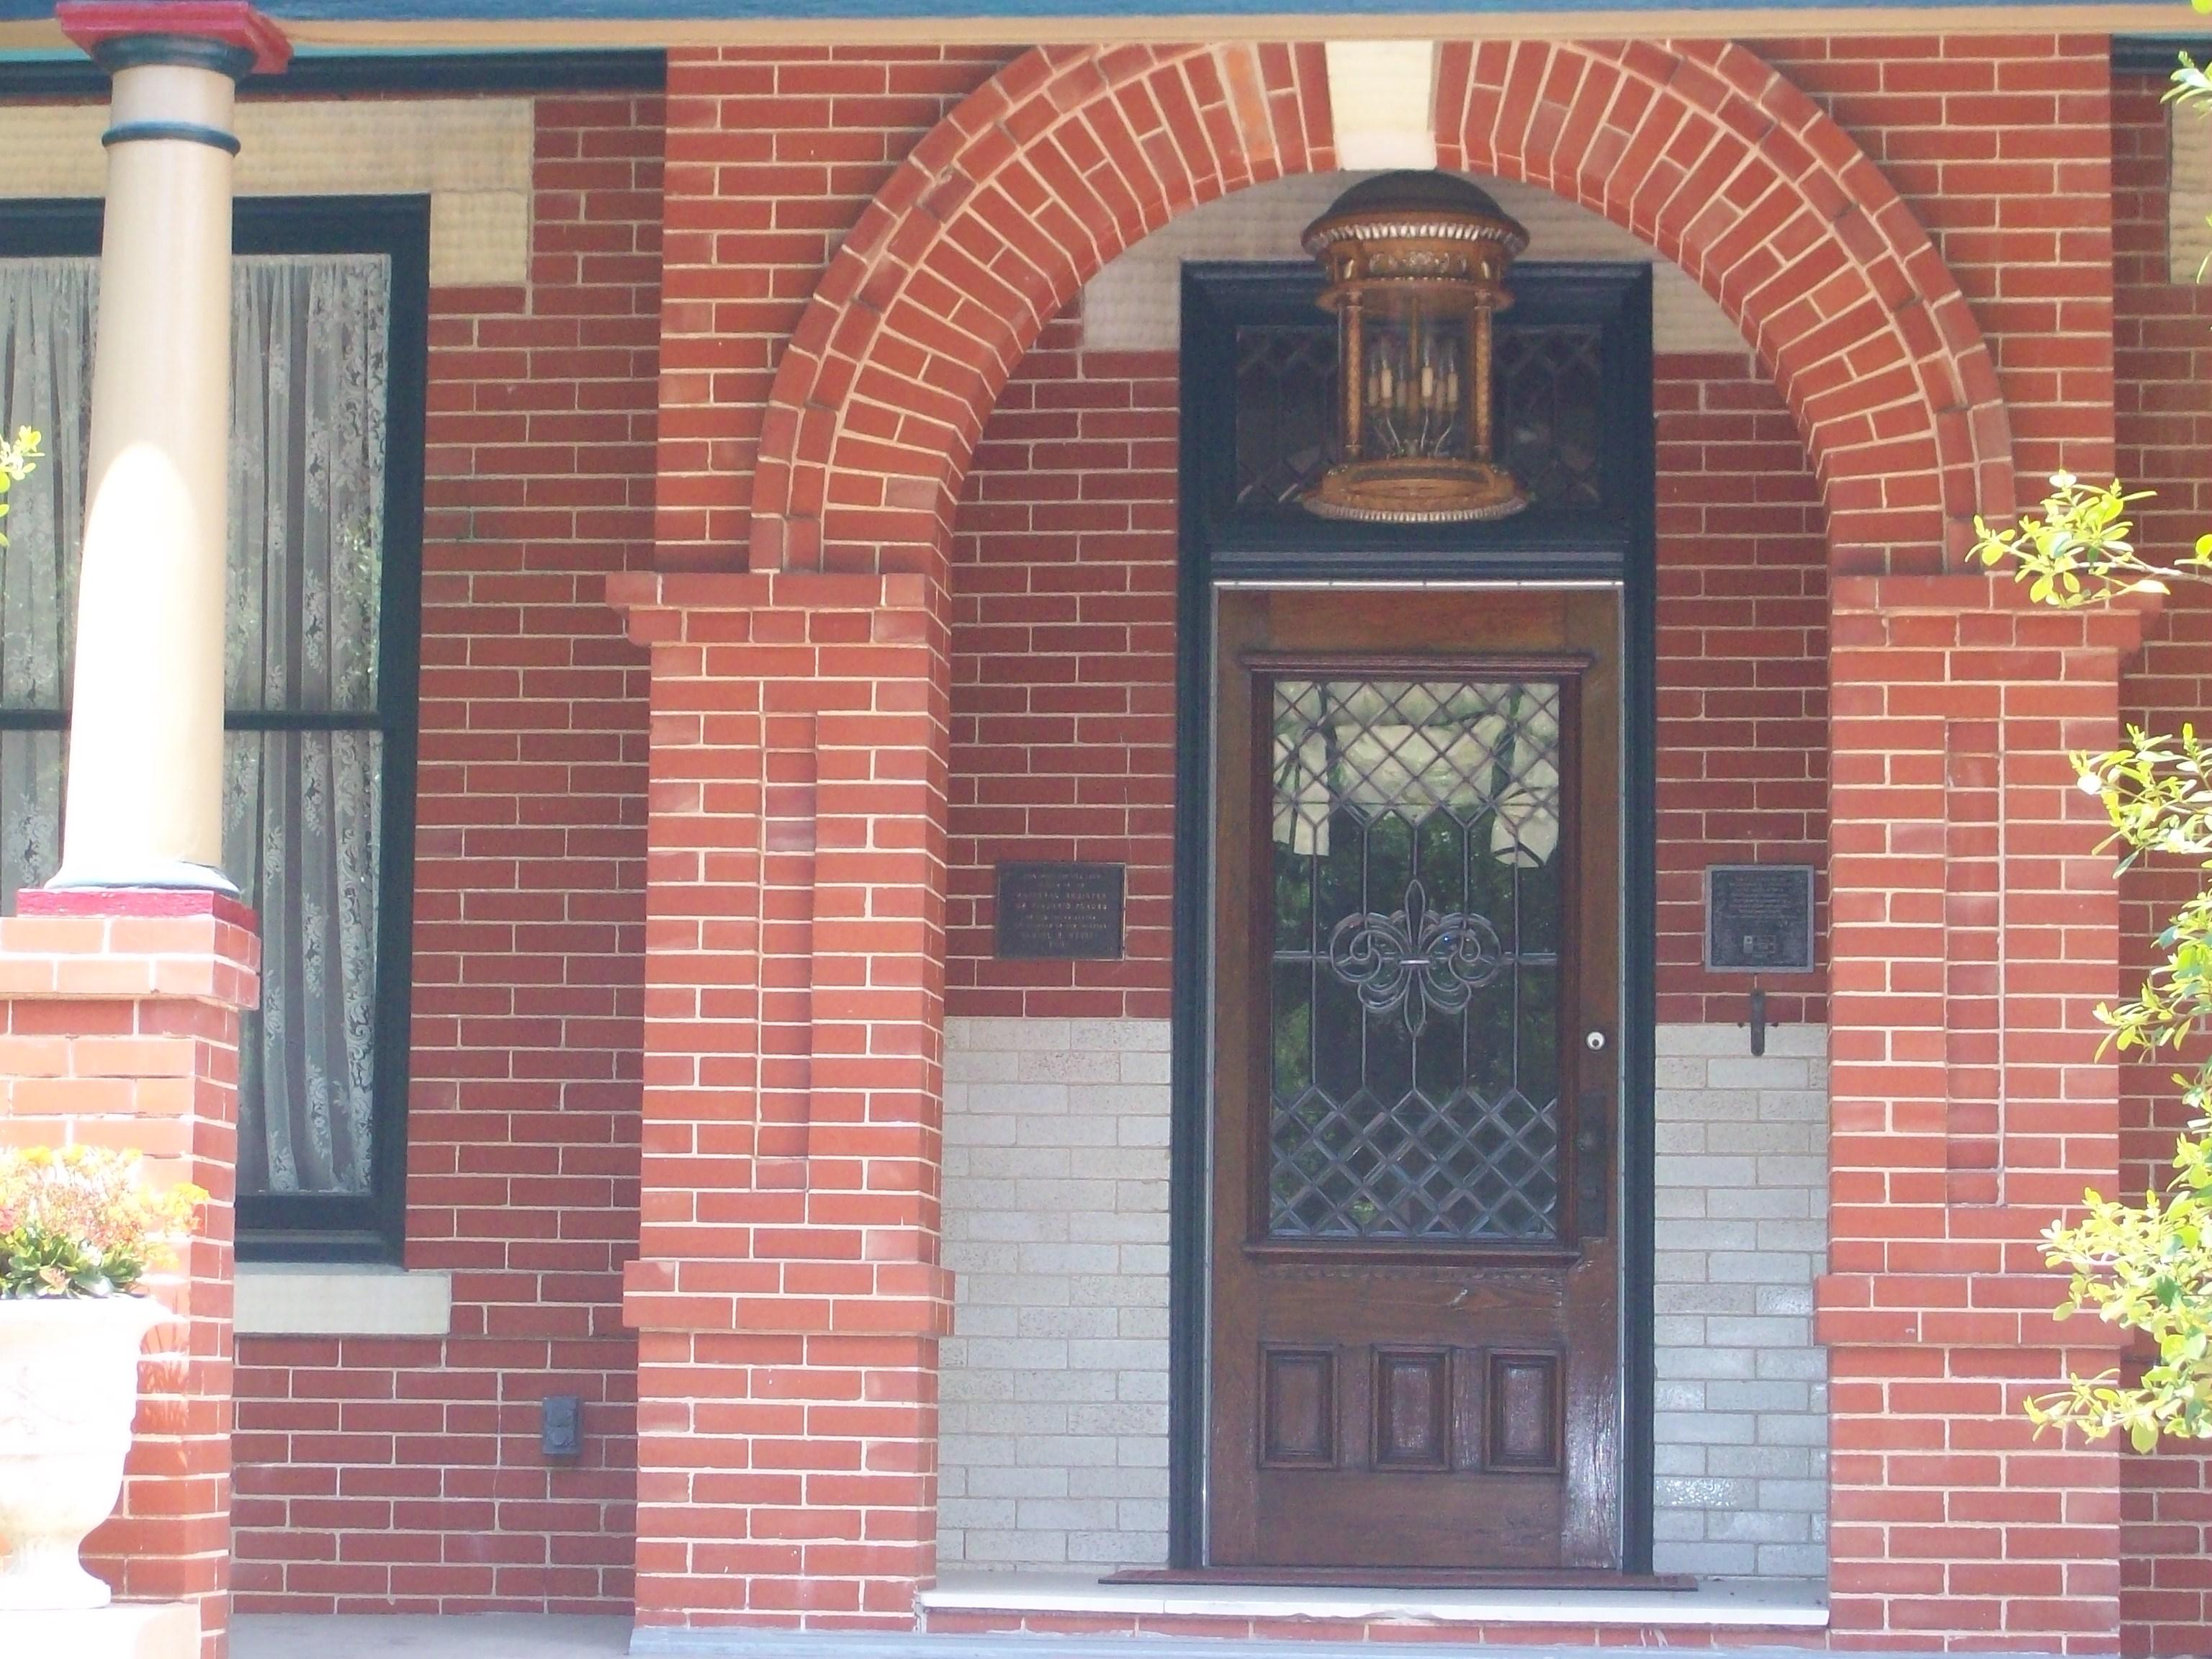 FileWebber House front door (Houston Texas).JPG & File:Webber House front door (Houston Texas).JPG - Wikimedia Commons